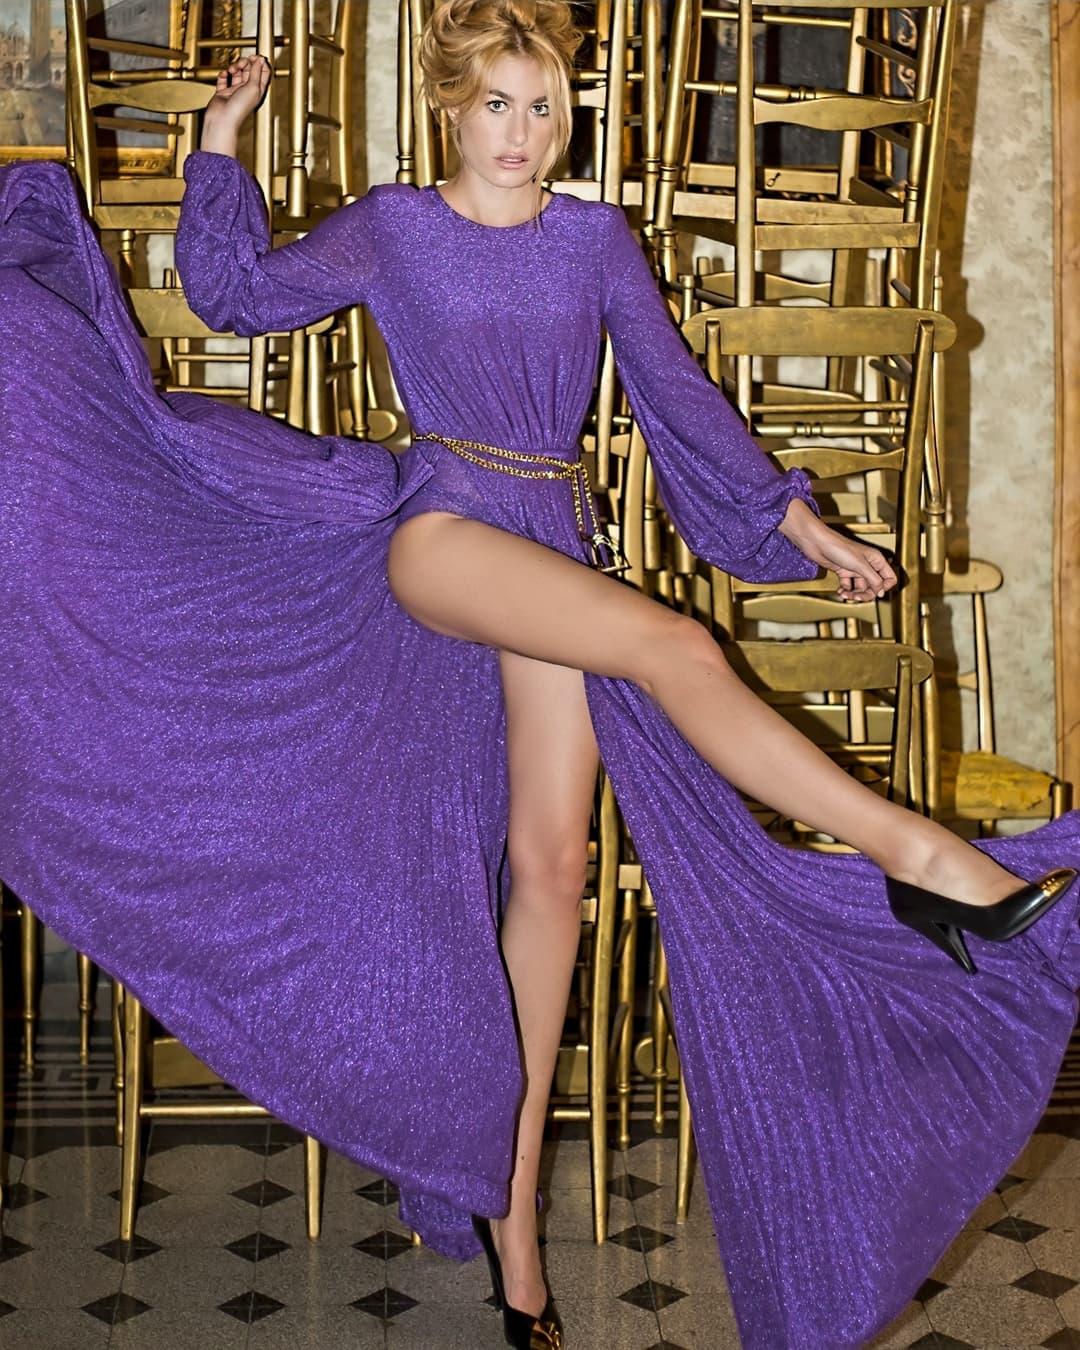 Angelica Preziosi che gambe! Splendida